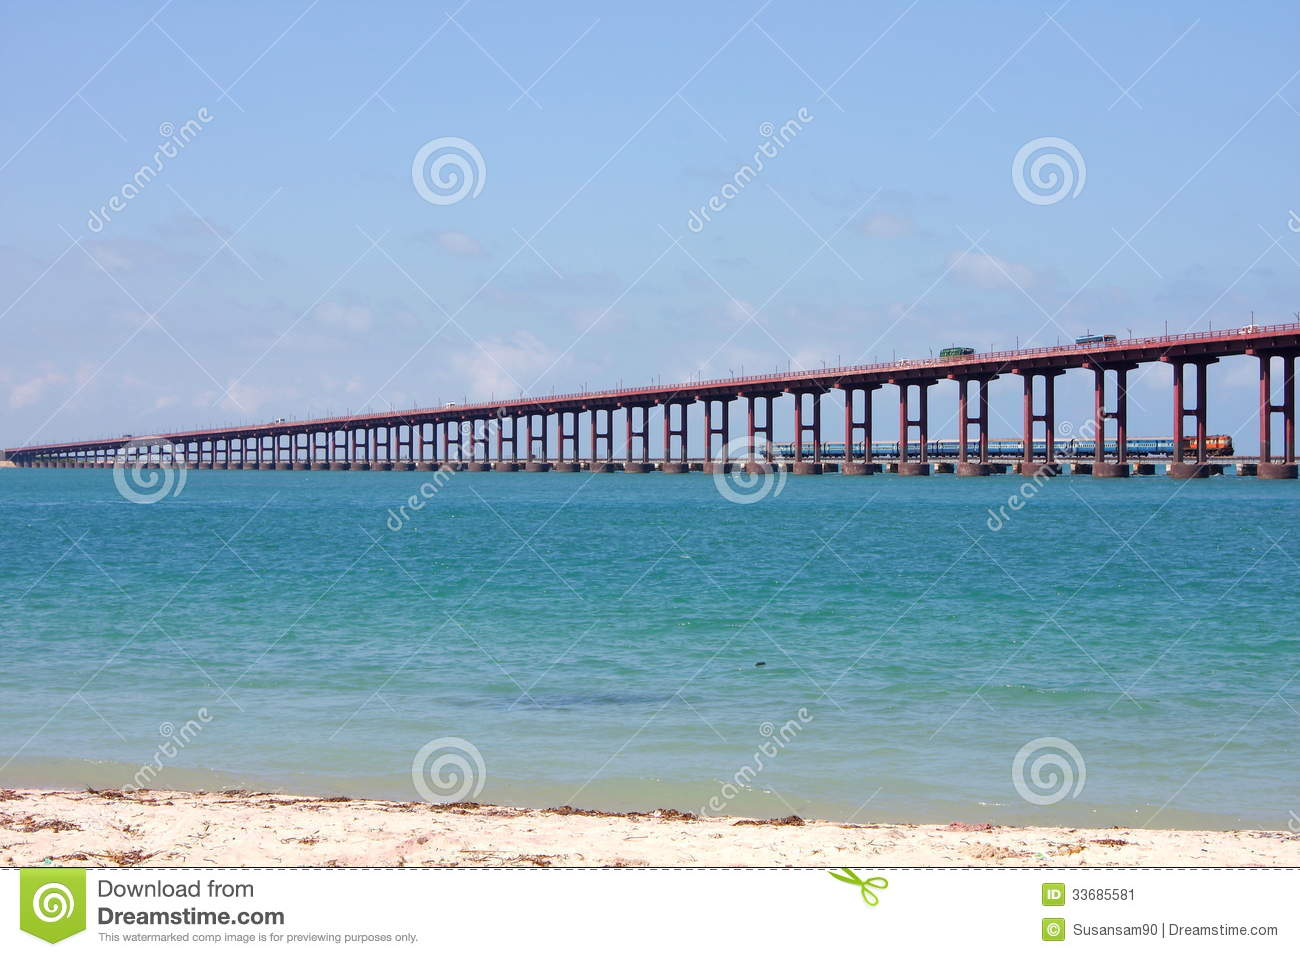 Pamban Bridge,Rameswaram,South India. Stock Image.